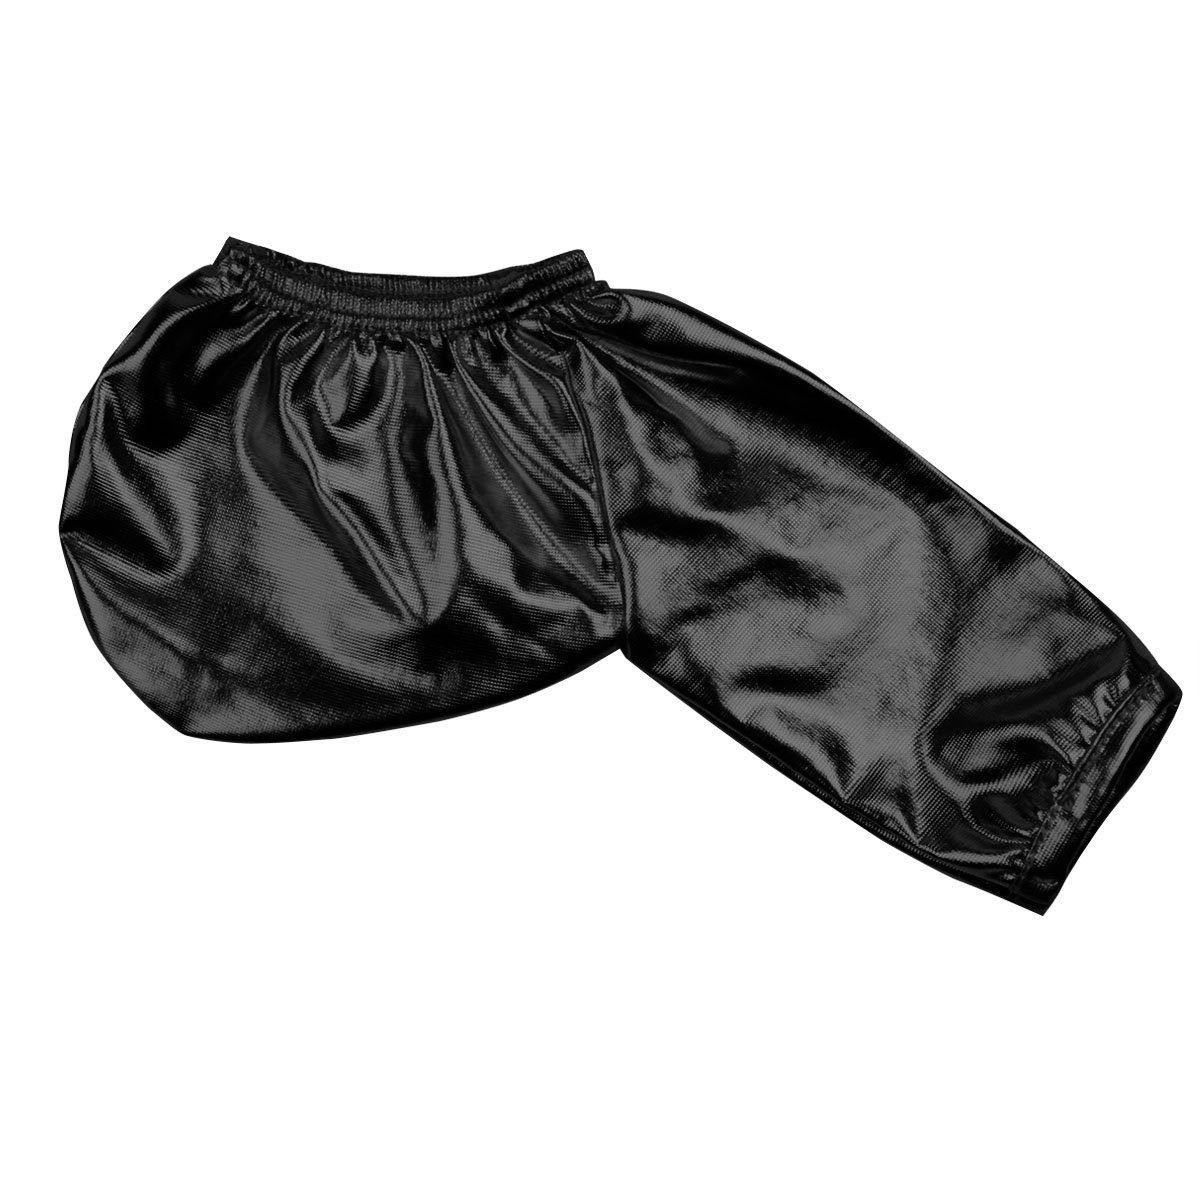 inlzdz Mens Wet Look Shiny Metallic Faux Leather C-String Briefs Bikini Underwear